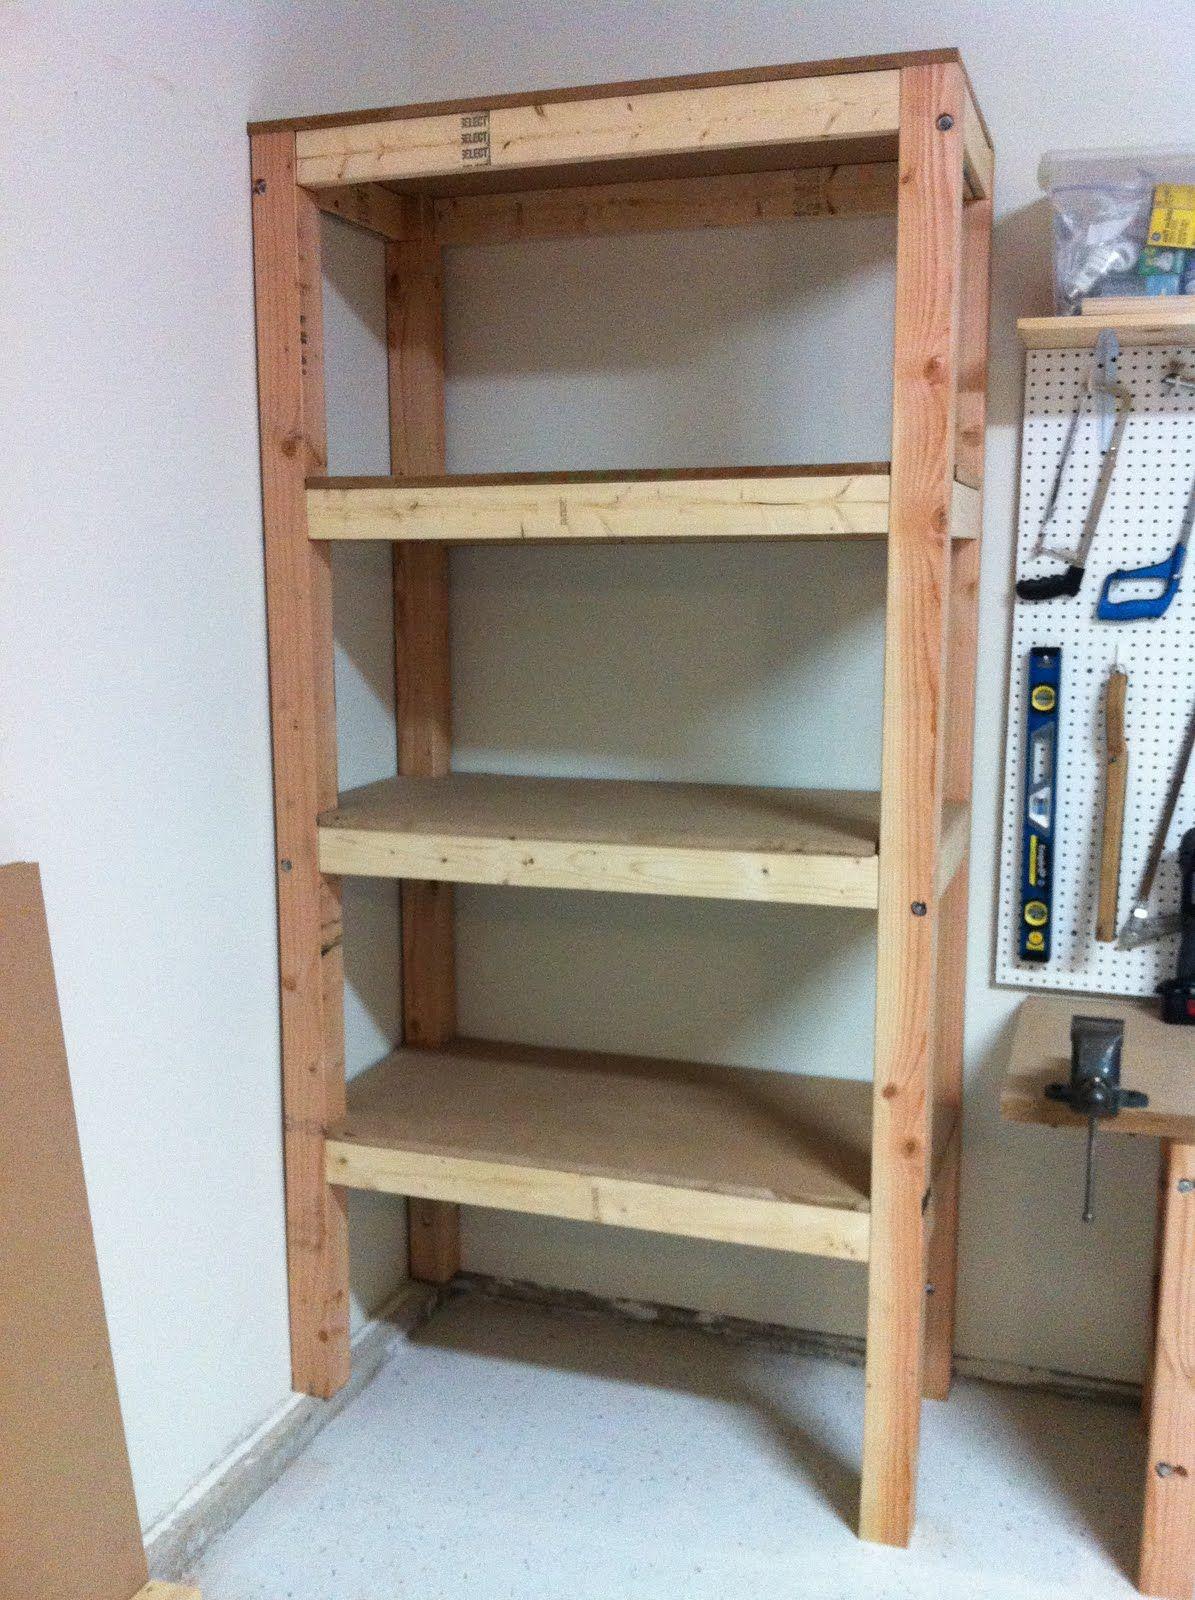 DIY Garage Shelving Ideas Shelves 3/4' MDF Board